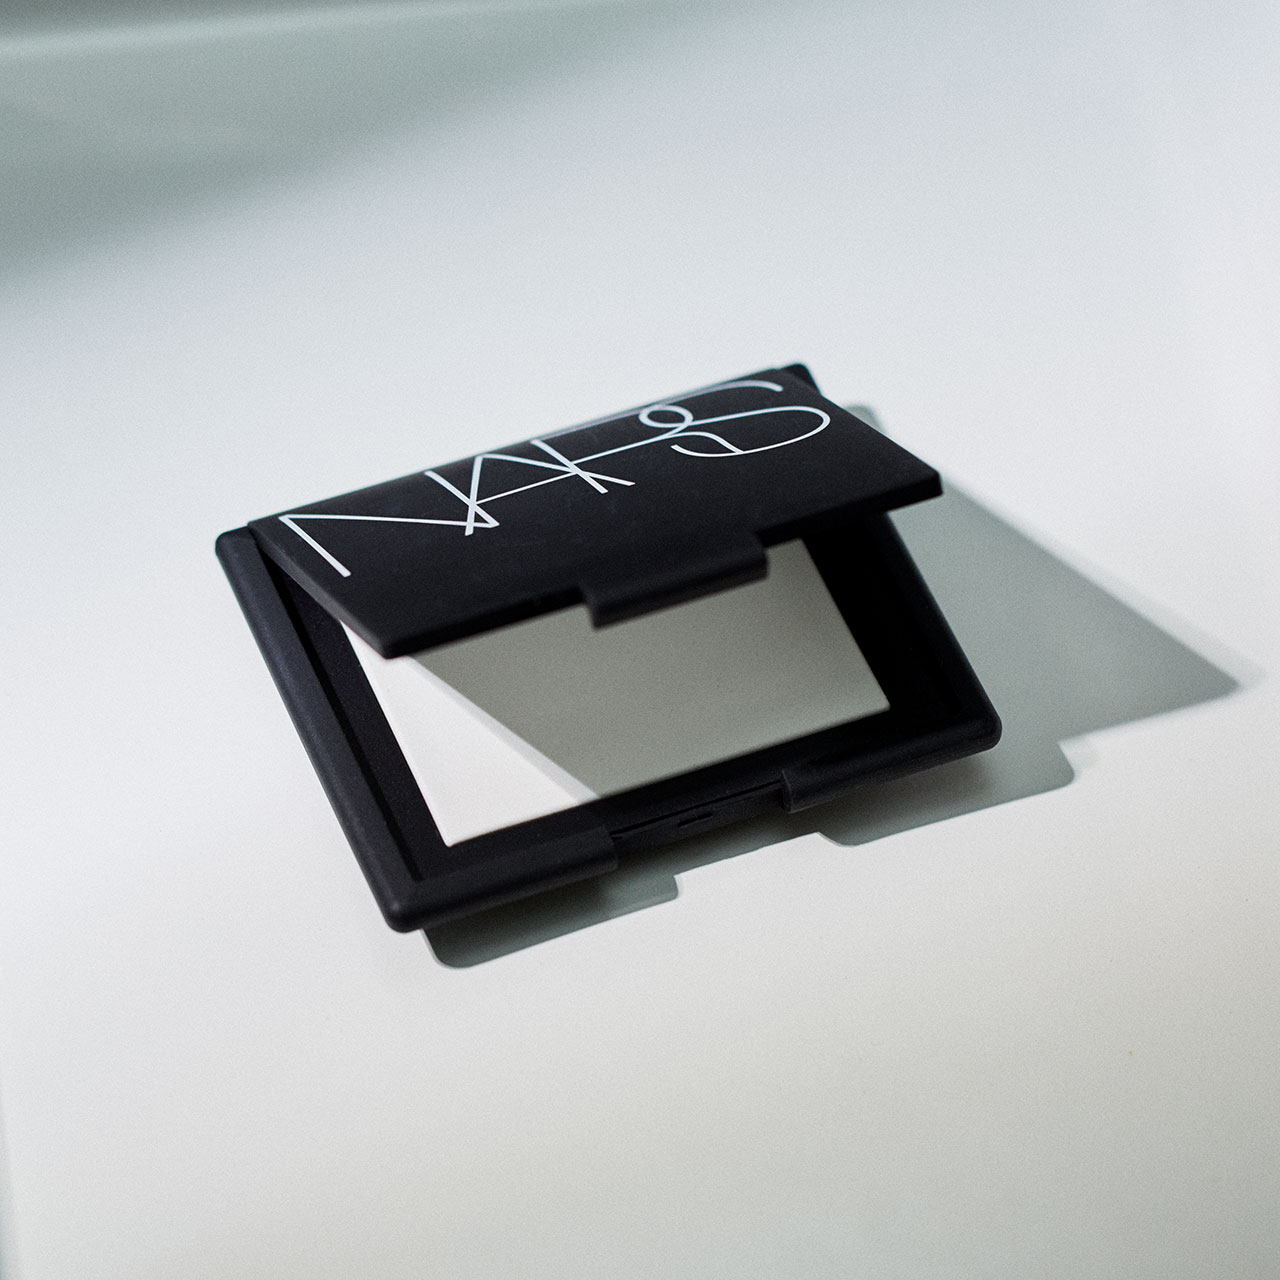 NARS ライトリフレクティングセッティングパウダー プレストN ¥4,700